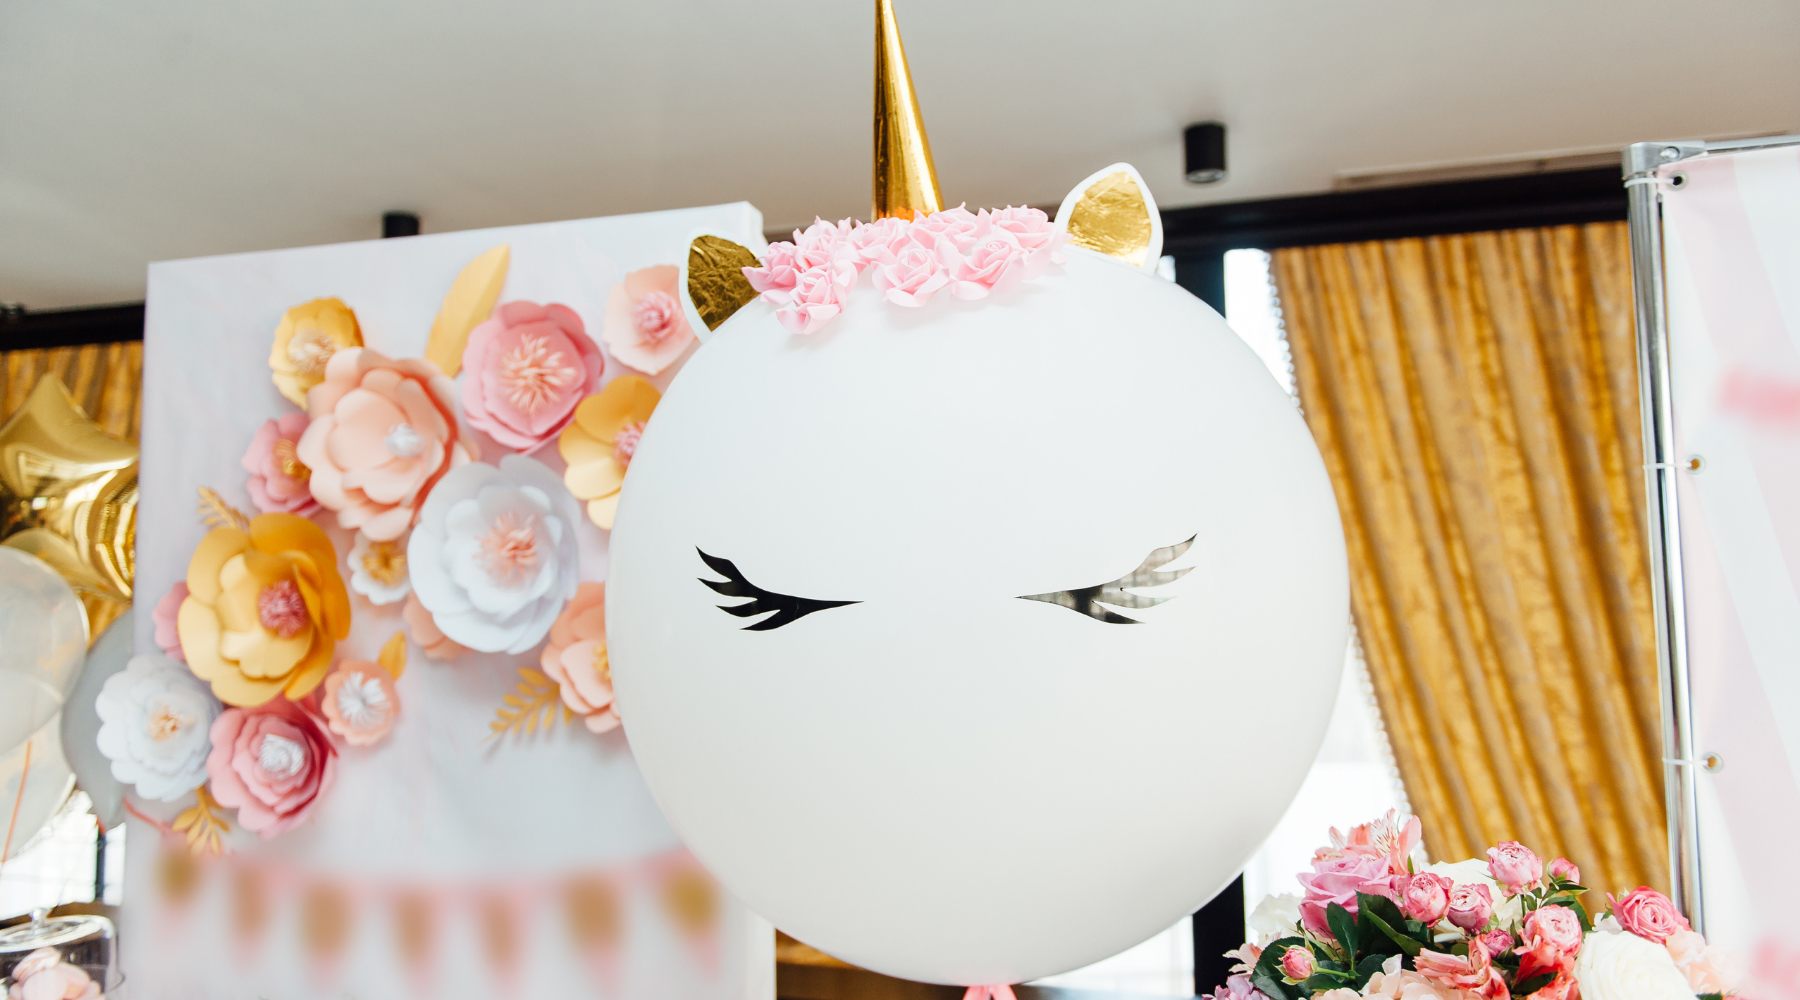 Unicorn birthday balloon and paper flowers